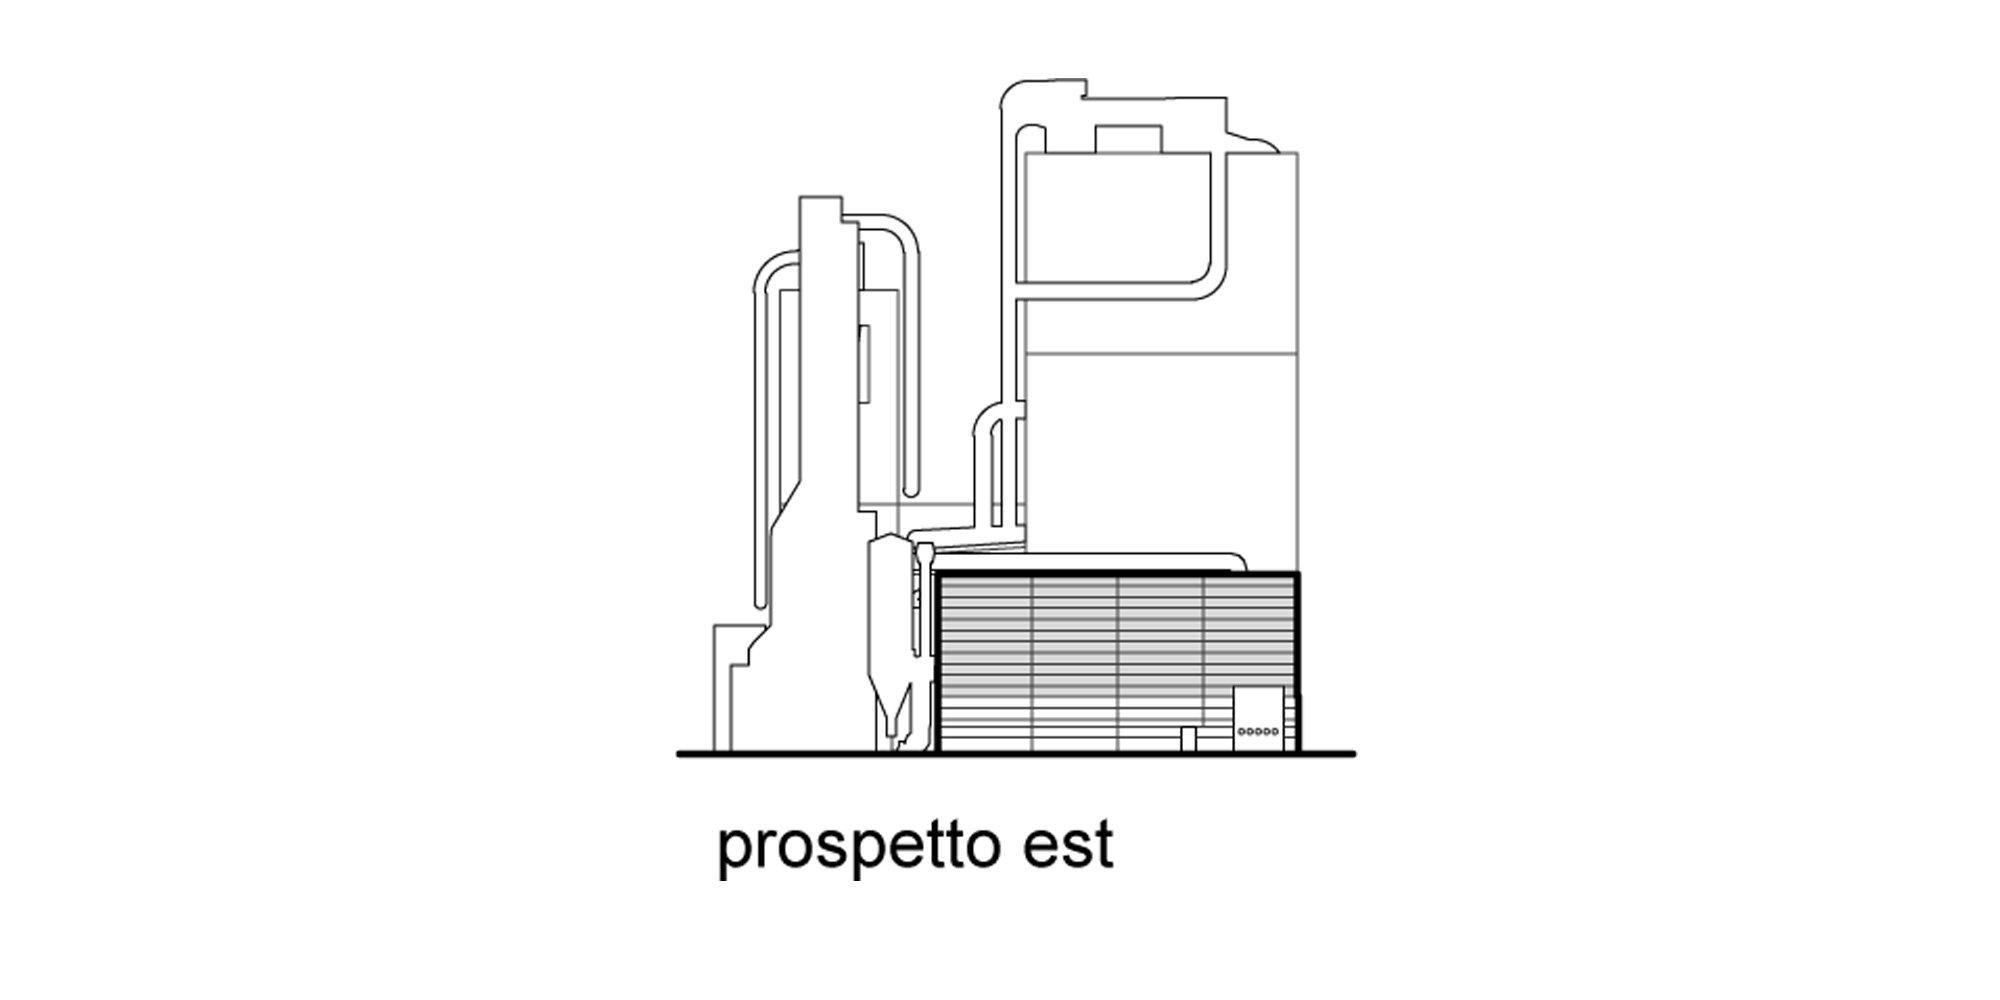 East elevation © Valle Architetti Associati